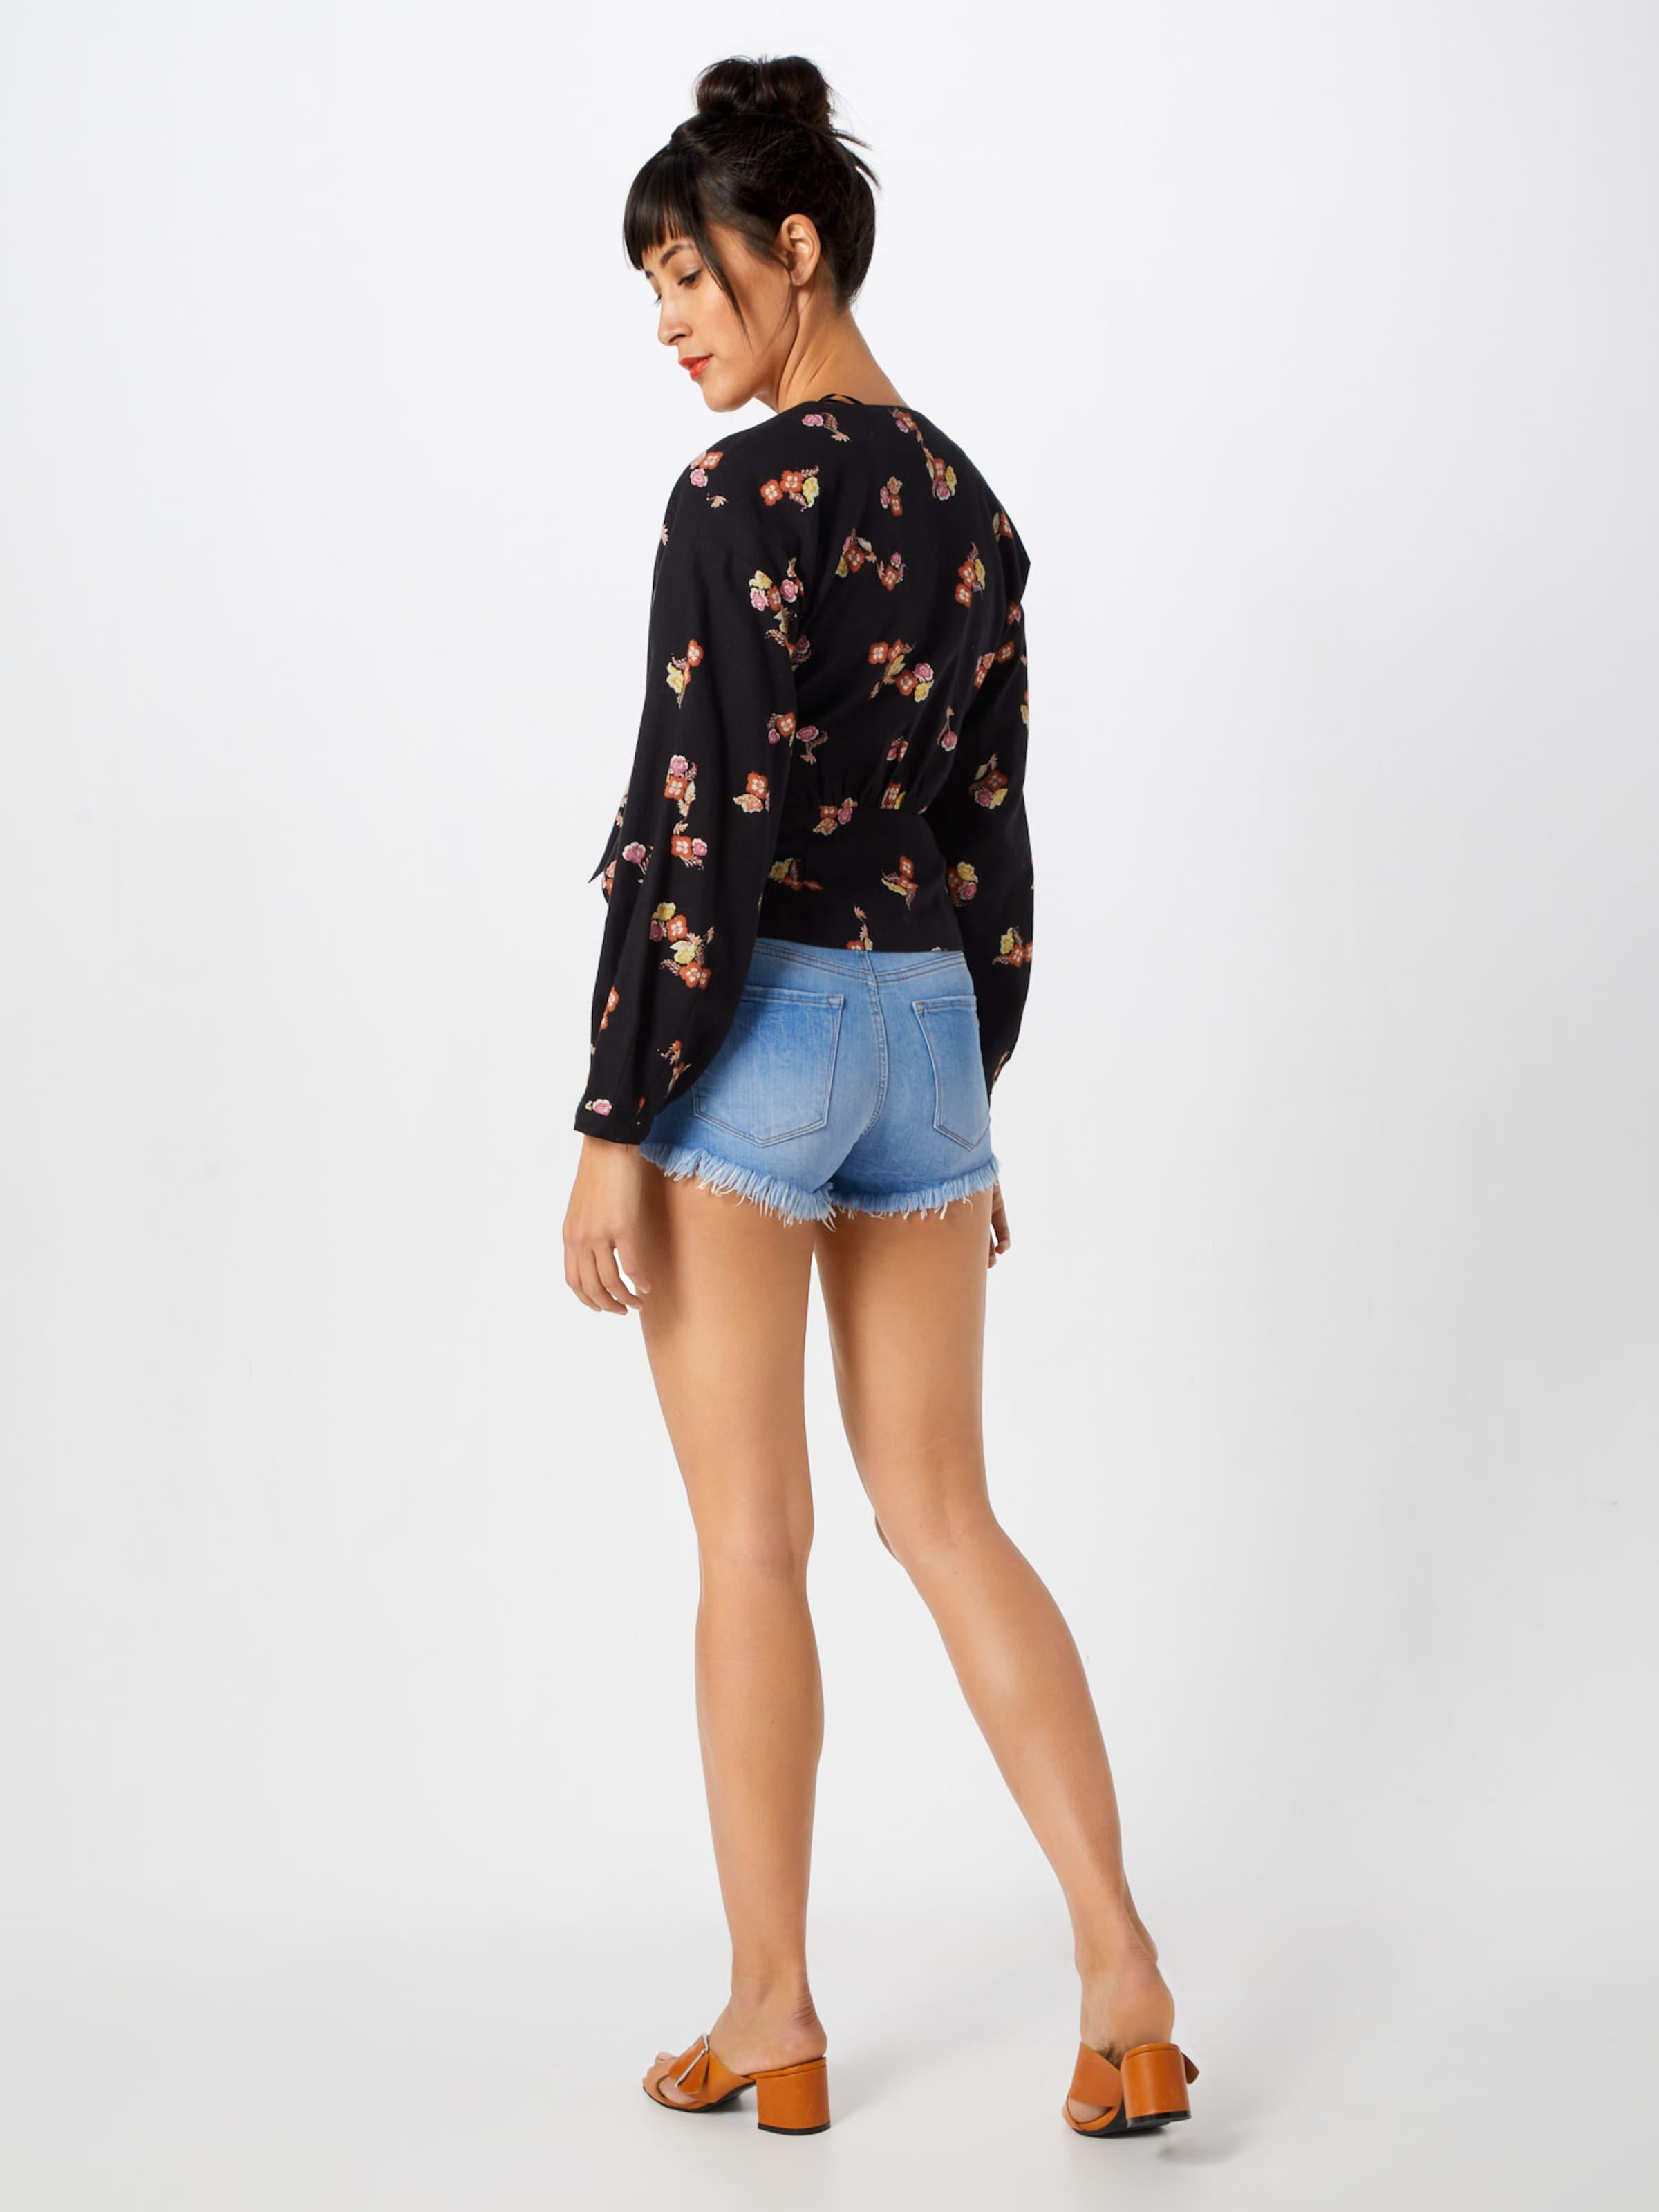 Shorts In Ltb Denim 'pamela' Blue 8vnOmN0w